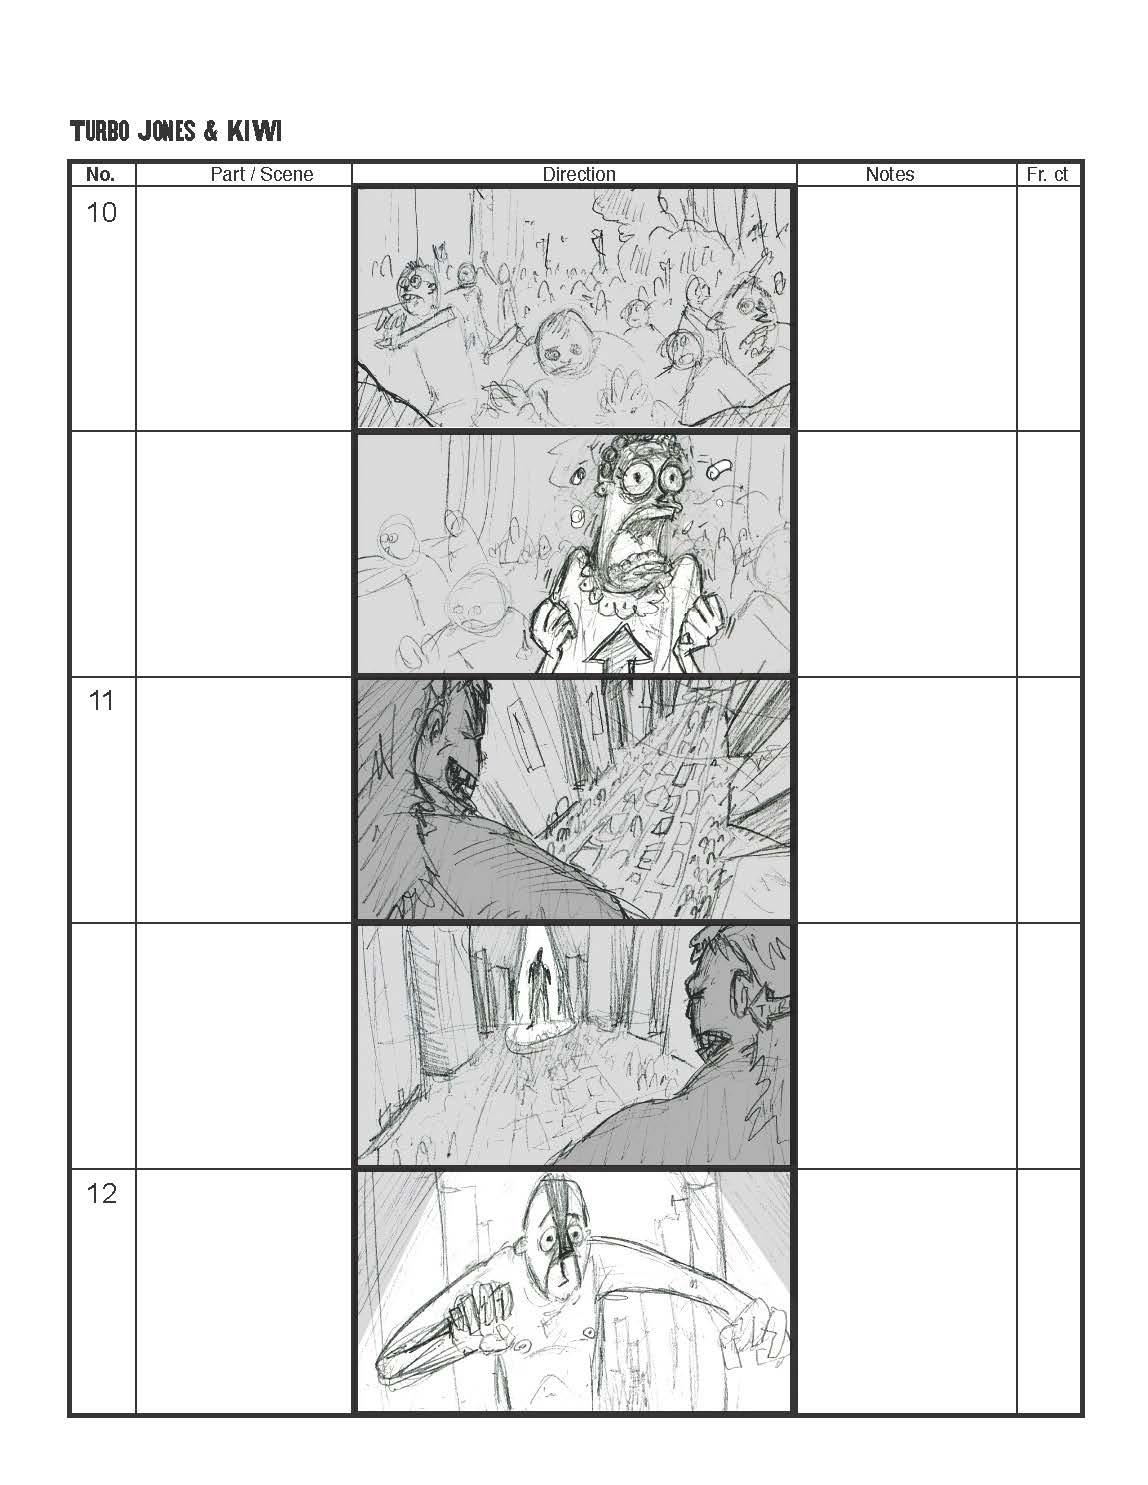 TJK_Storyboards_v01_HIGH_Page_05.jpg